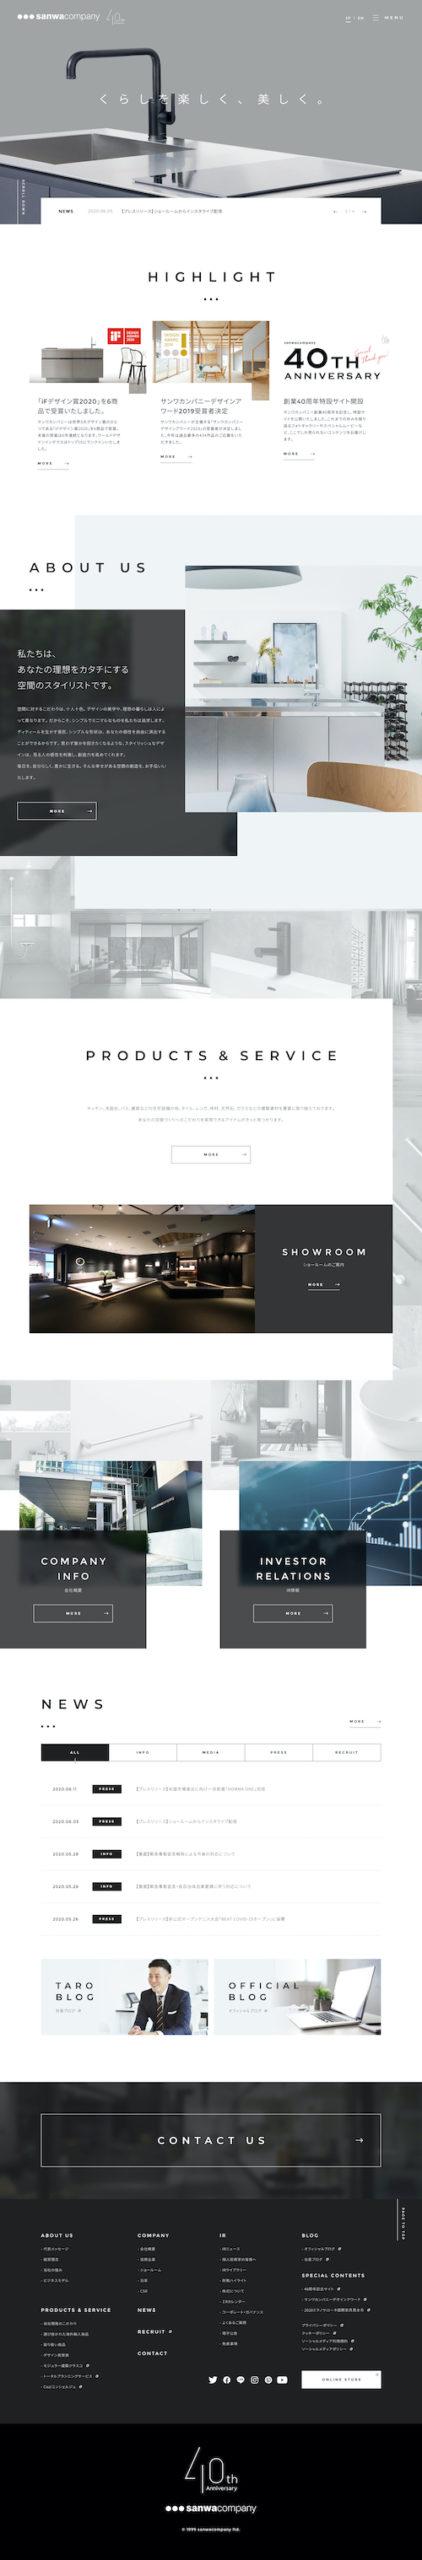 info-sanwacompany-top